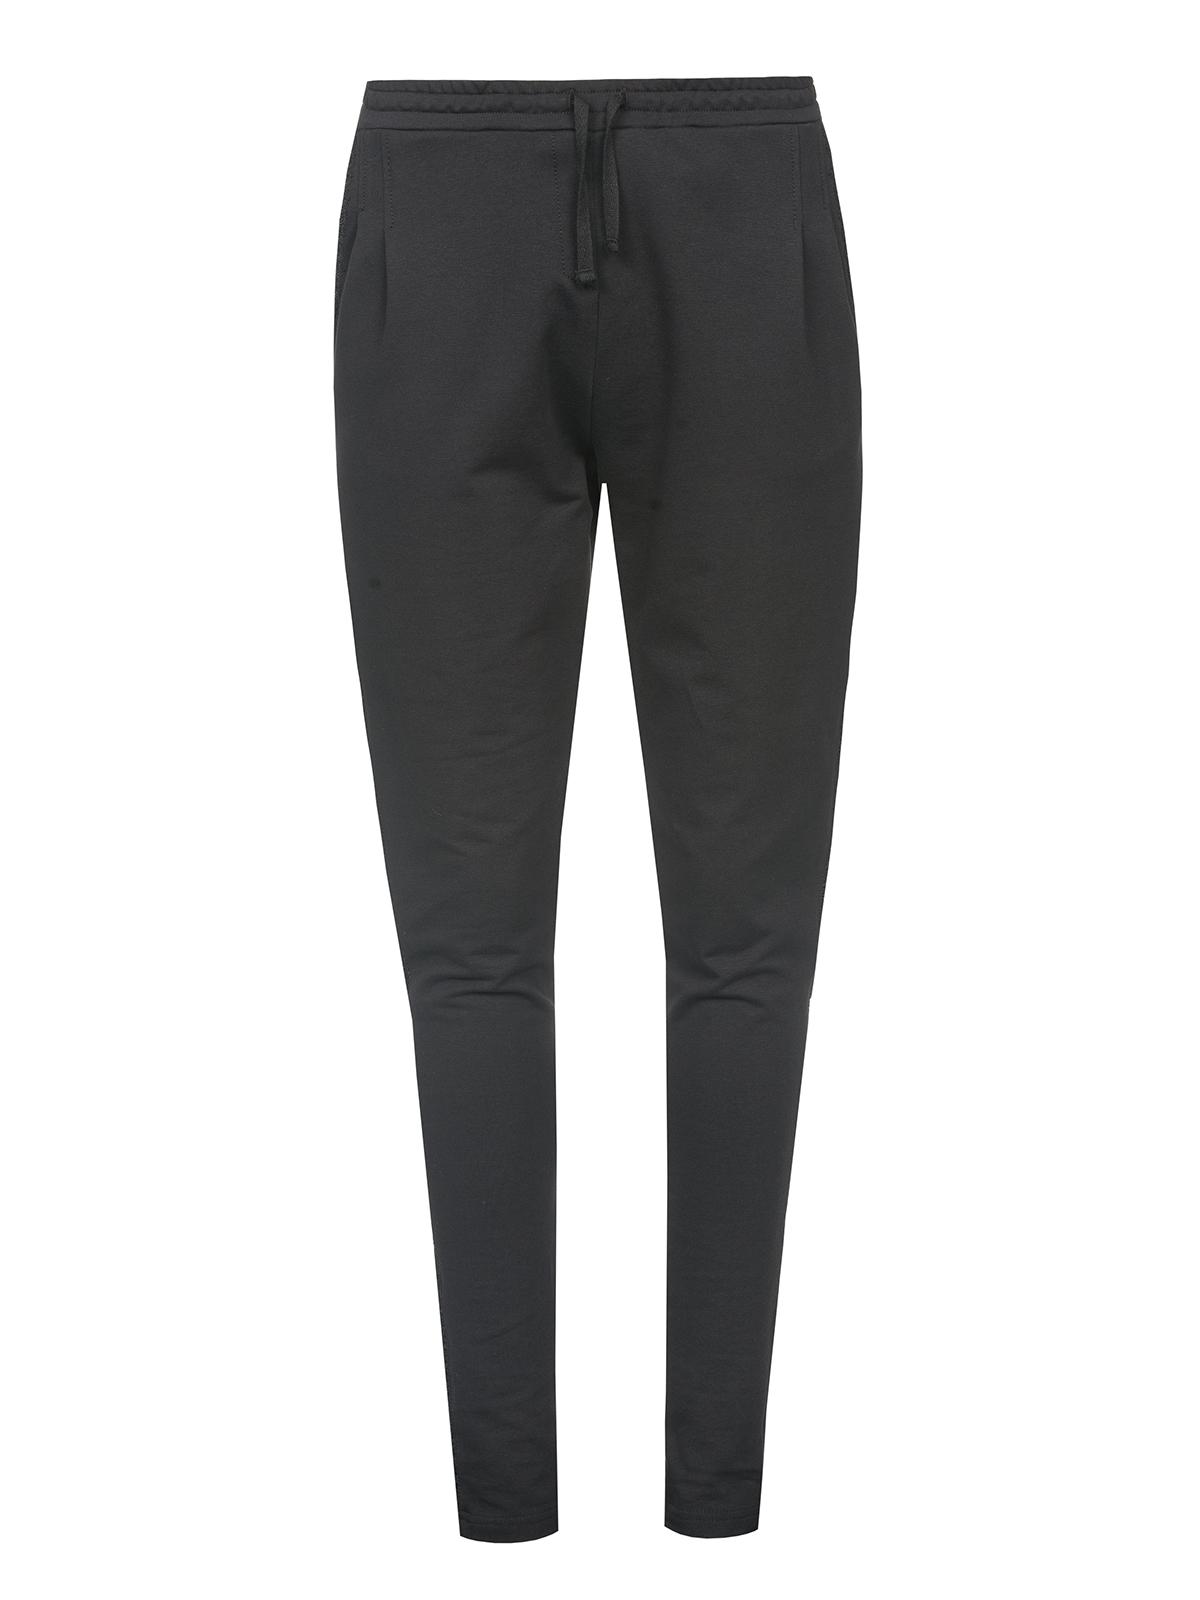 Hosen - Vive Maria Biker Girl Sweatpants schwarz – Größe XS  - Onlineshop NAPO Shop